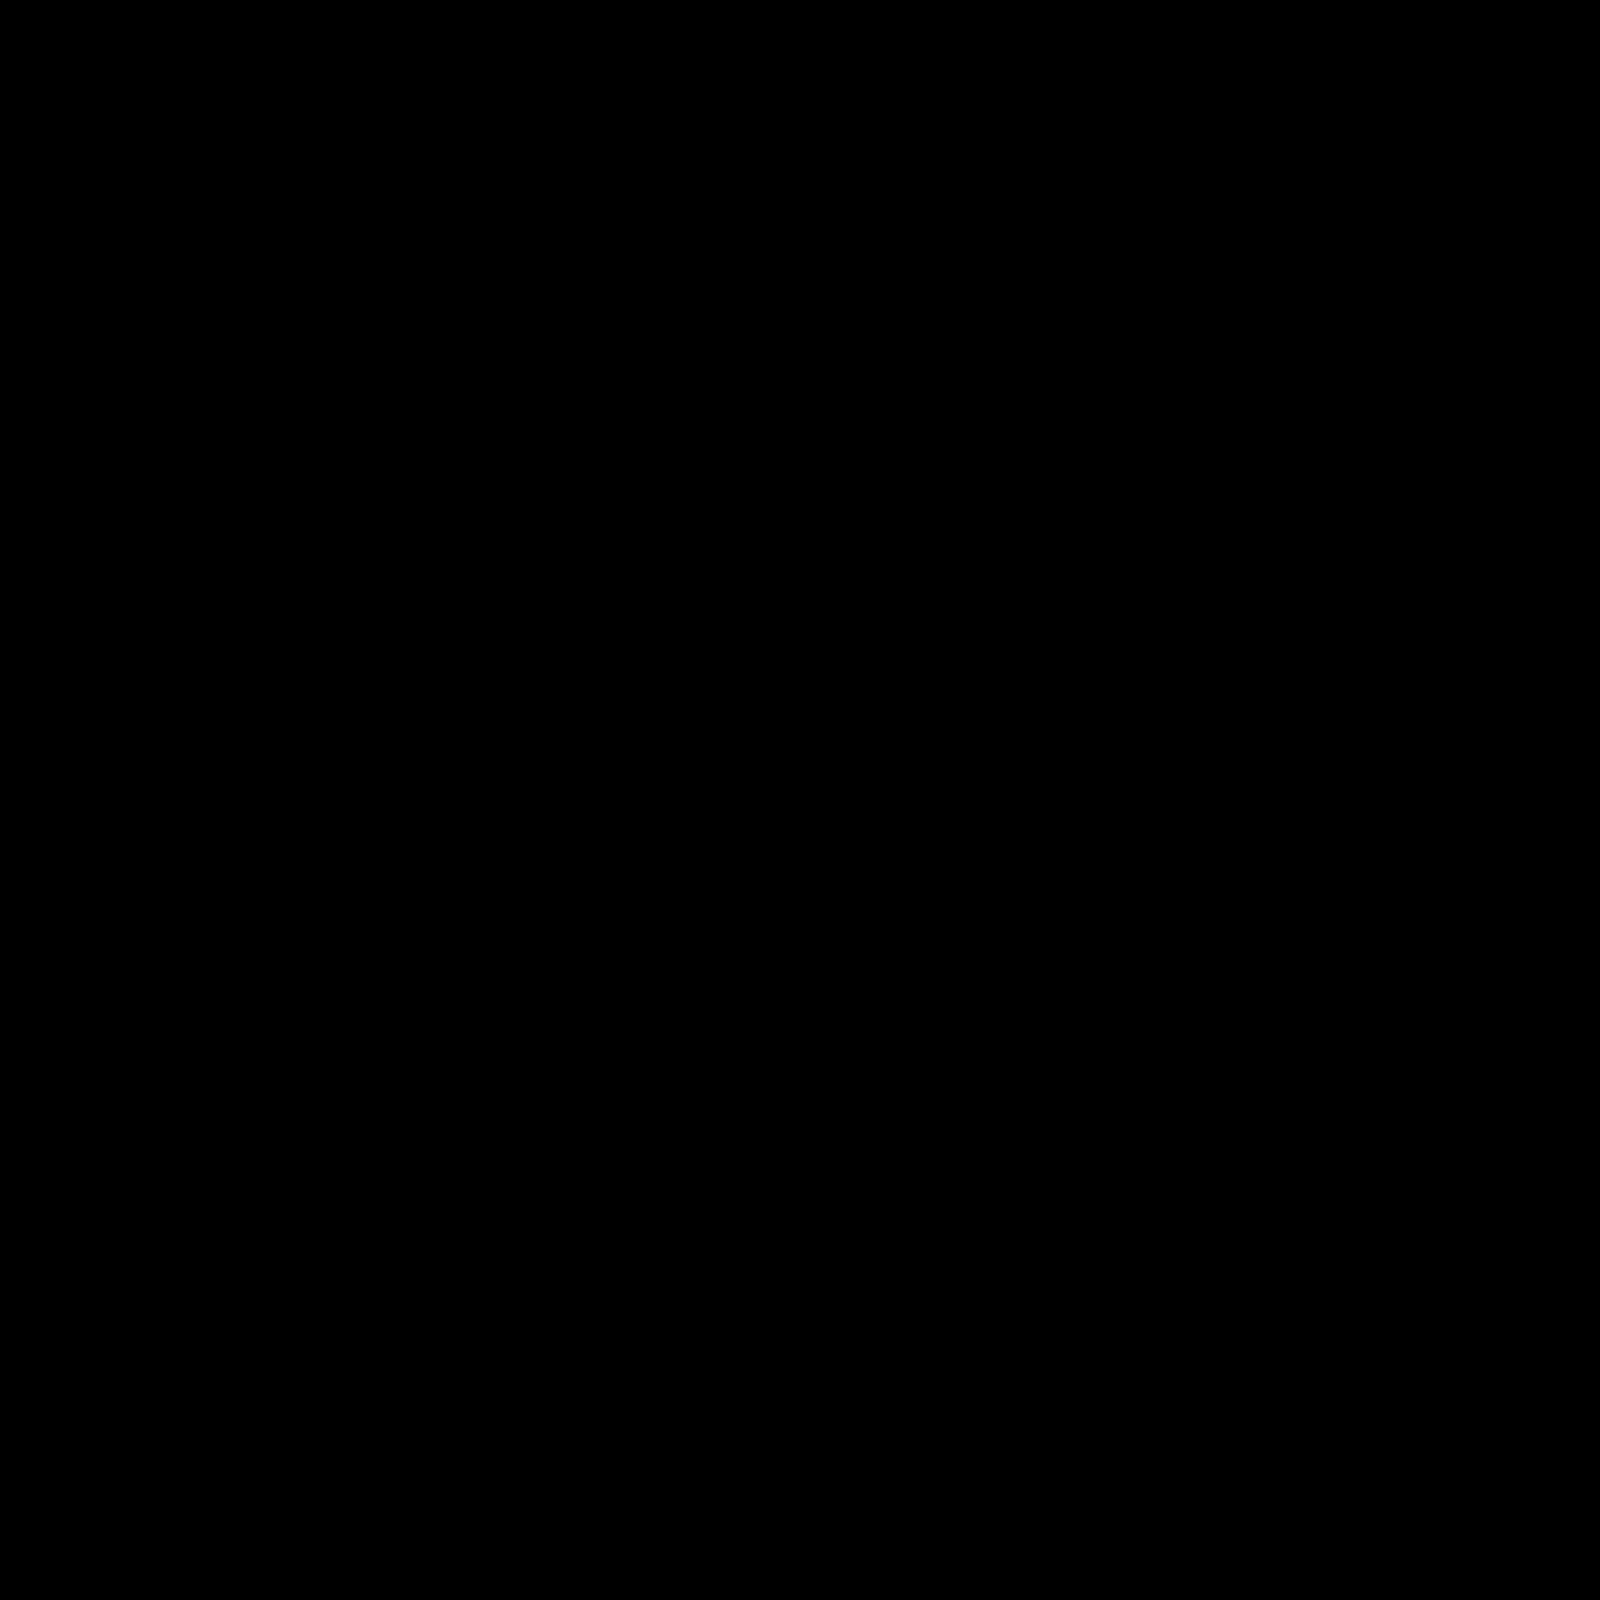 Звезда Давида, Маген Давид PNG